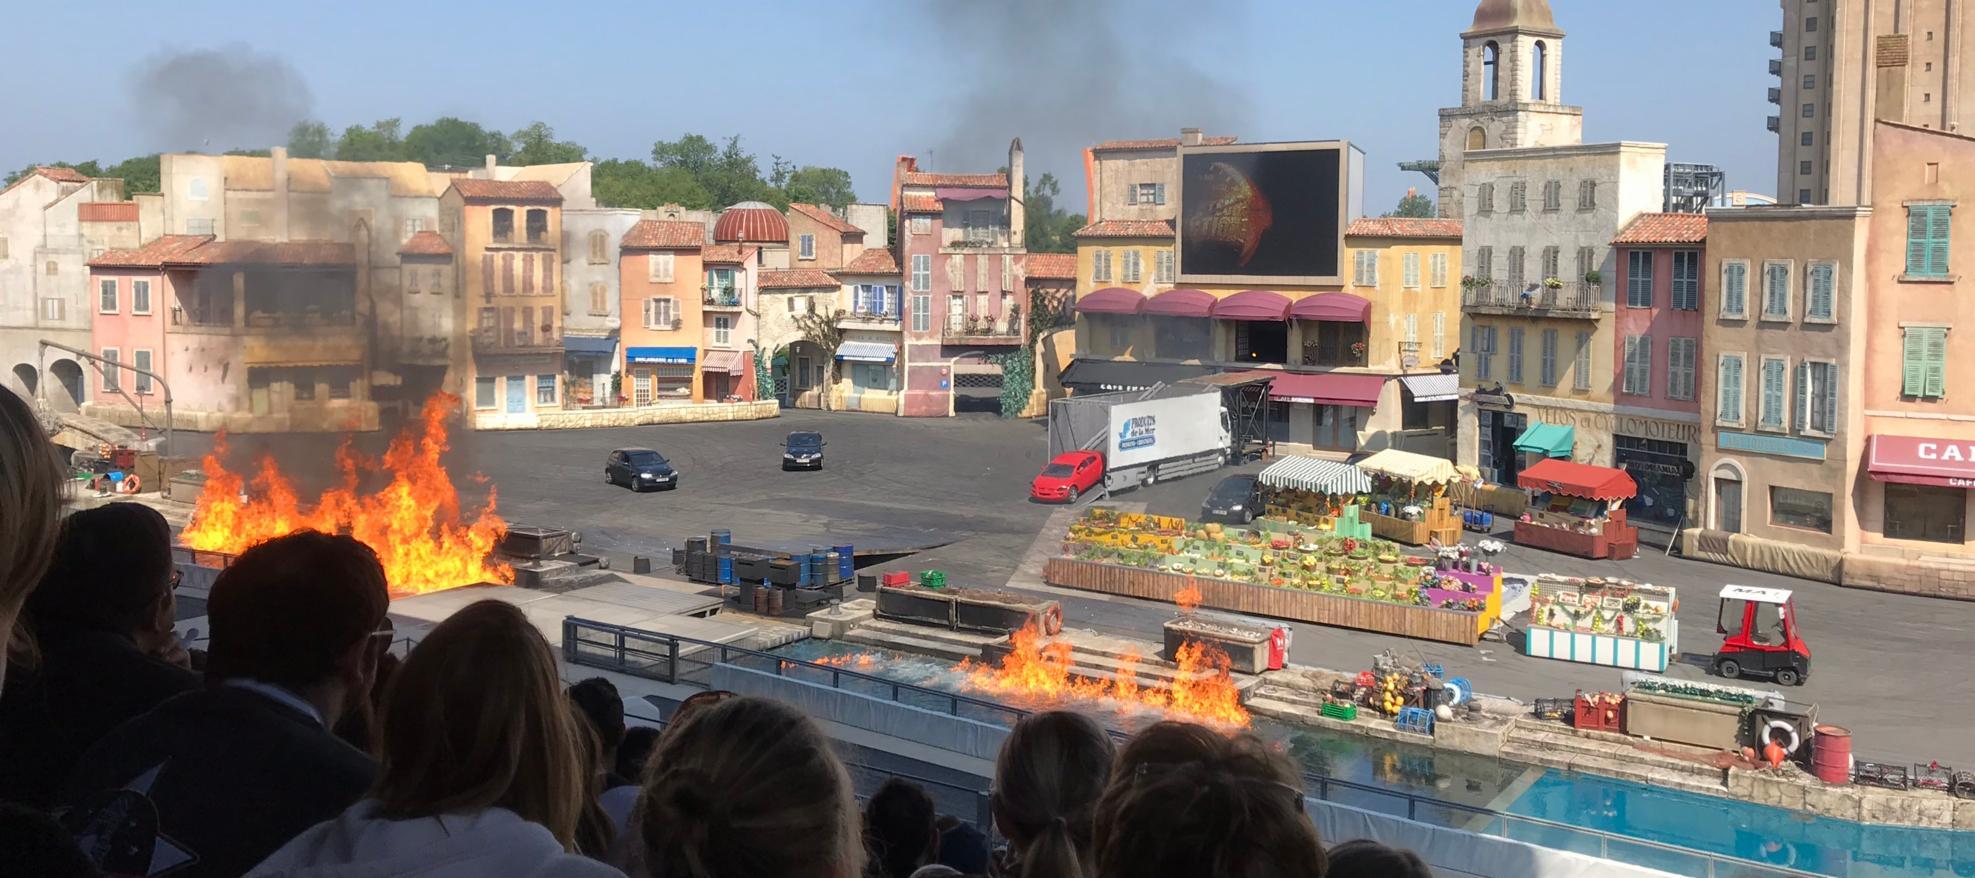 Moteurs... Action! Stunt Show Spectacular at Disneyland Paris | Your Guide to Disneyland Paris